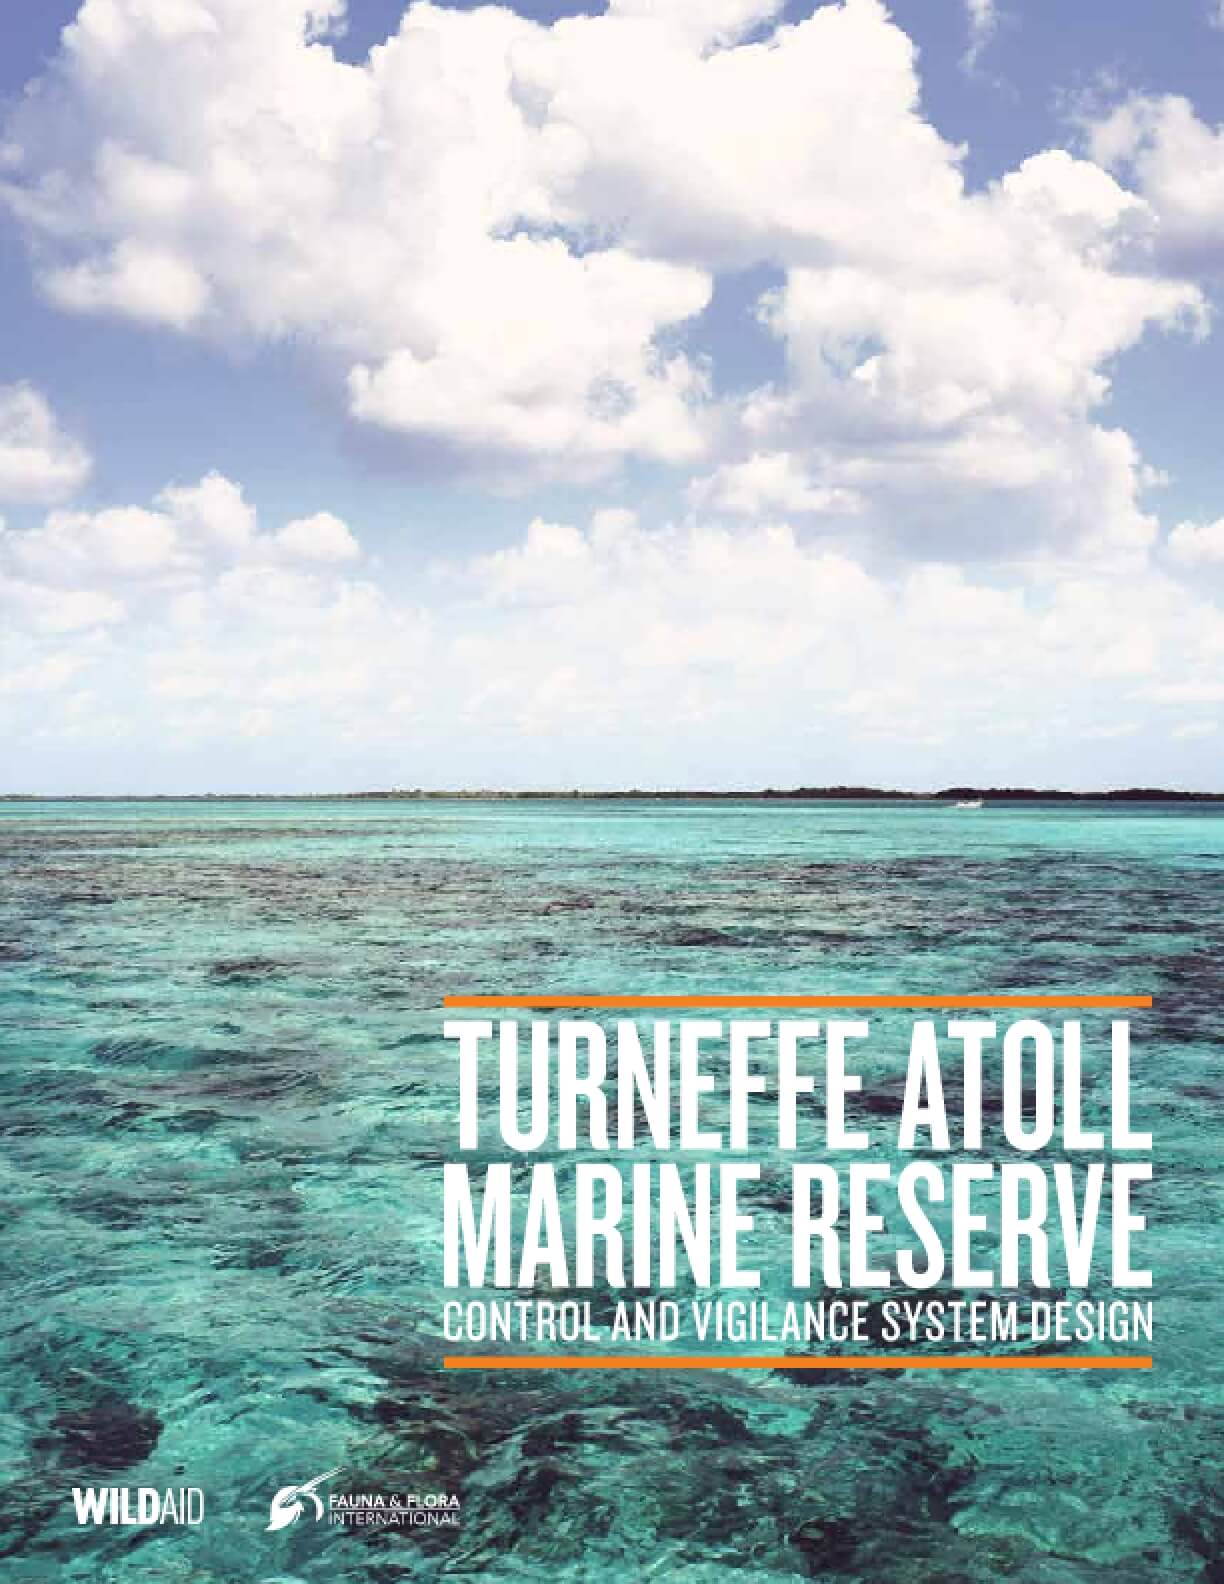 Turneffe Atoll Marine Reserve Control and Vigilance System Design